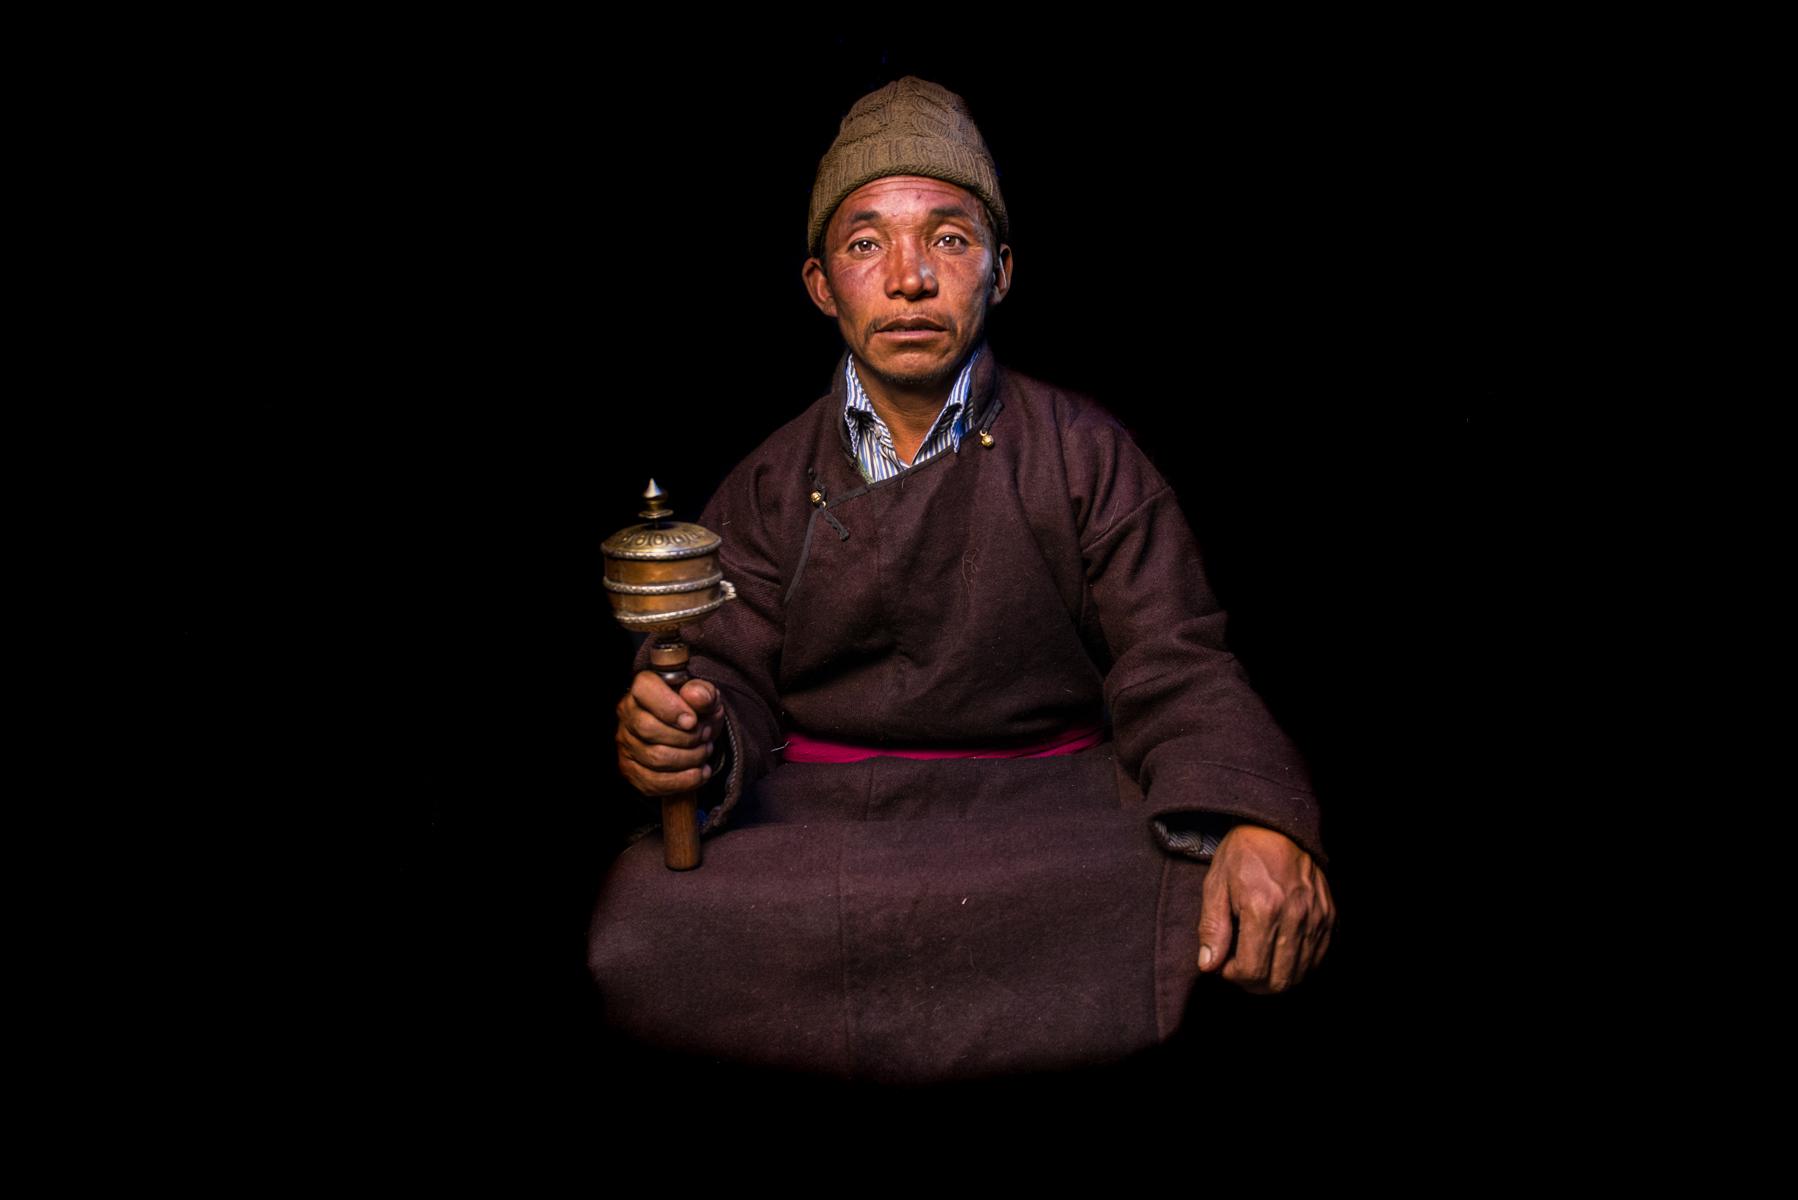 Changpa man, Tso Kar